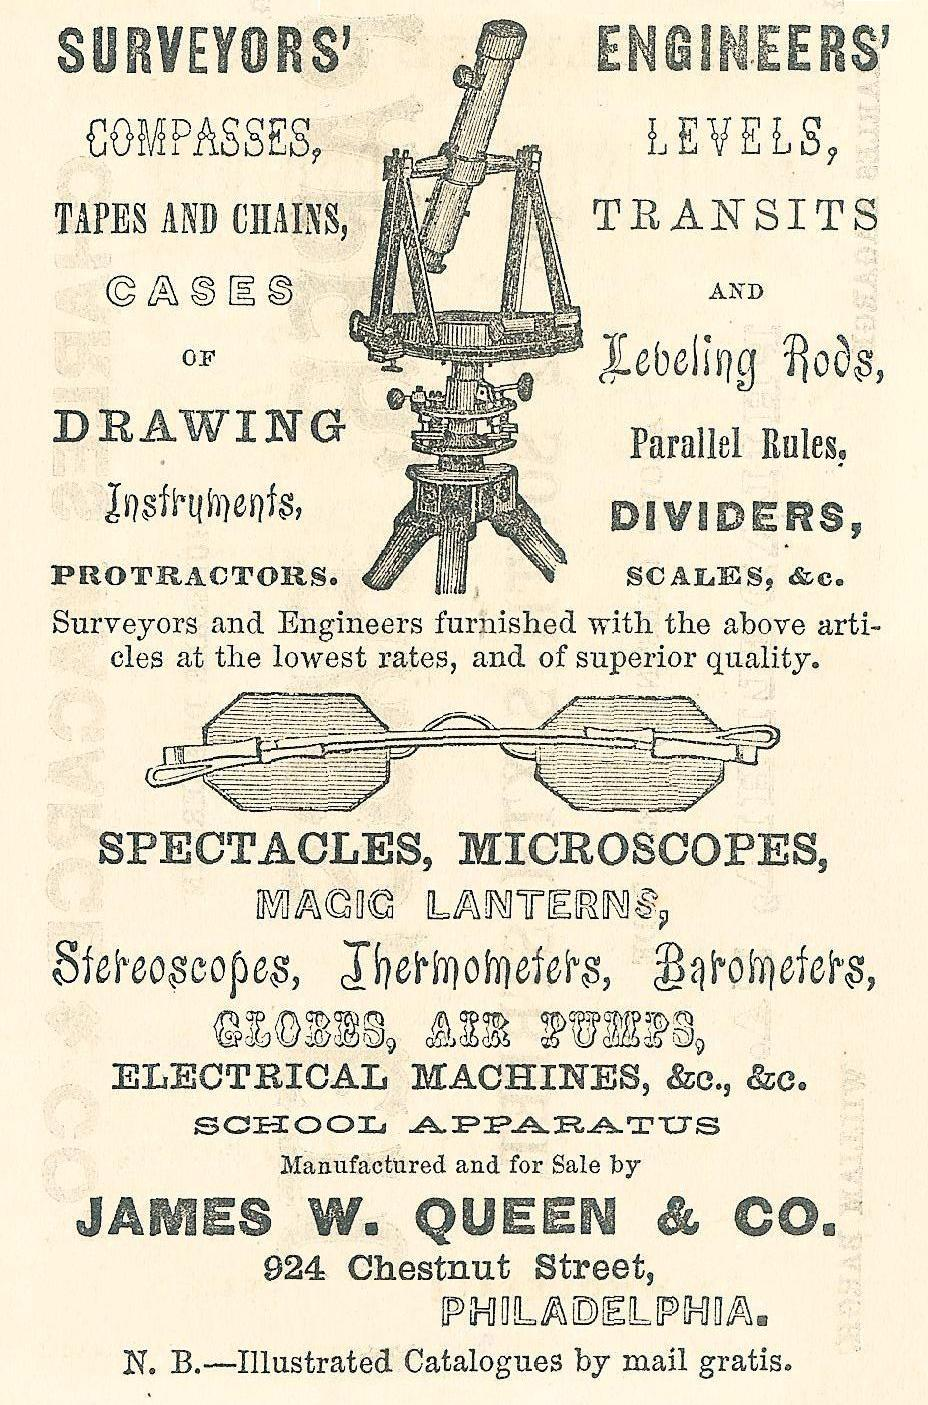 Jas W Queen+Co,spectacles,scientific instruments,924 Chs